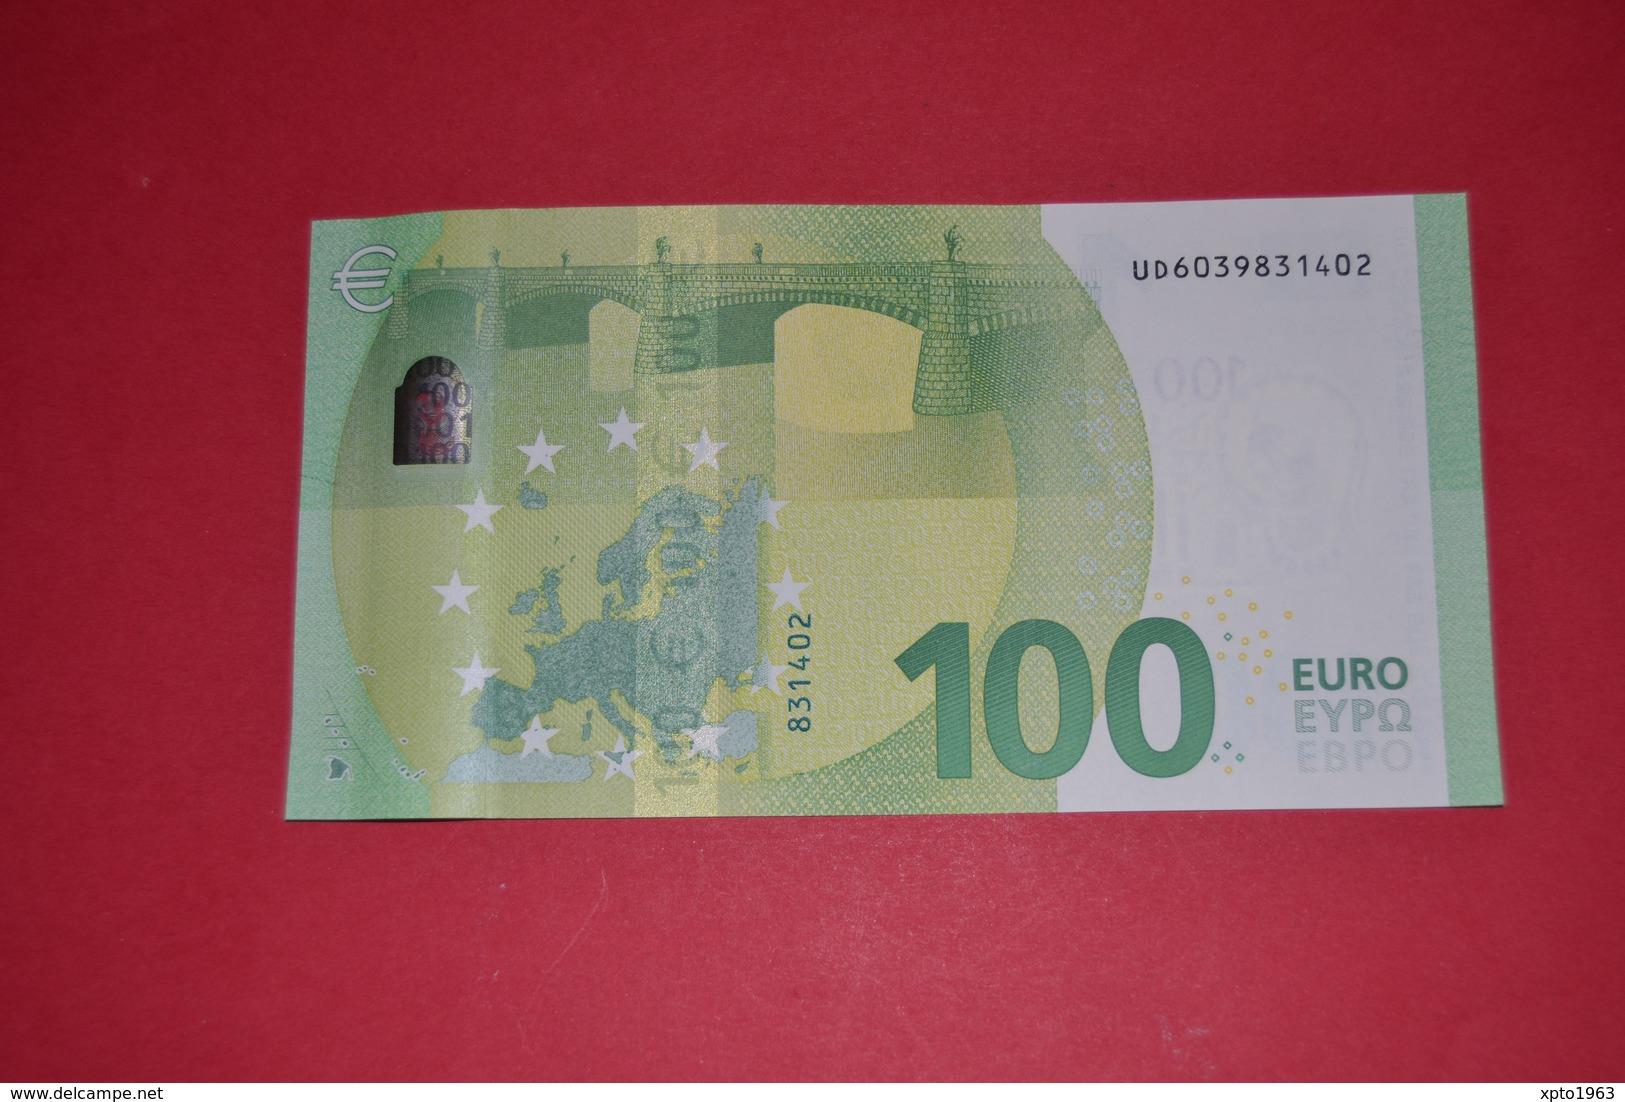 FRANCE 100 EURO - U002E5 - Série Europa - UD6039831402 - UNC NEUF - EURO